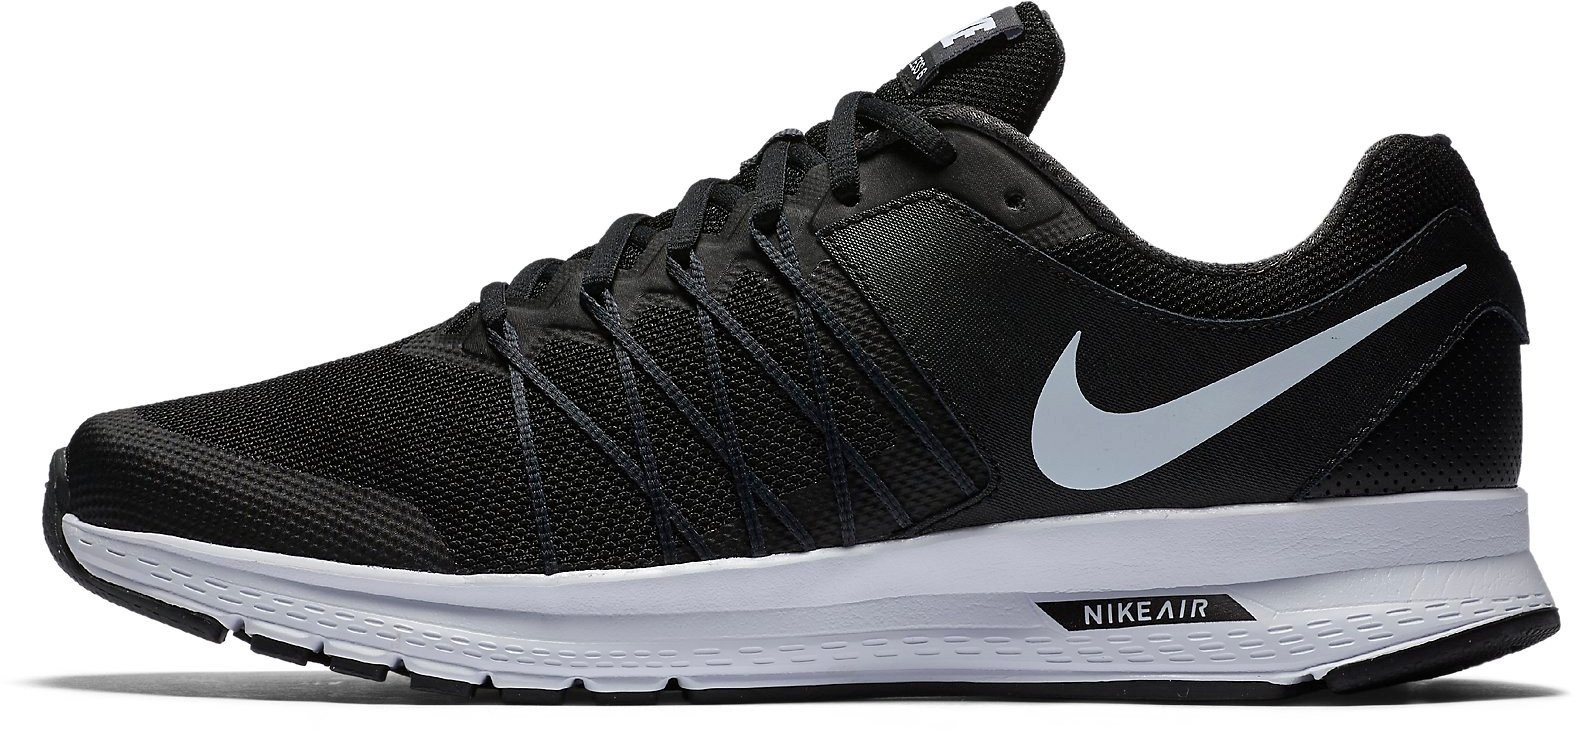 Running shoes Nike AIR RELENTLESS 6